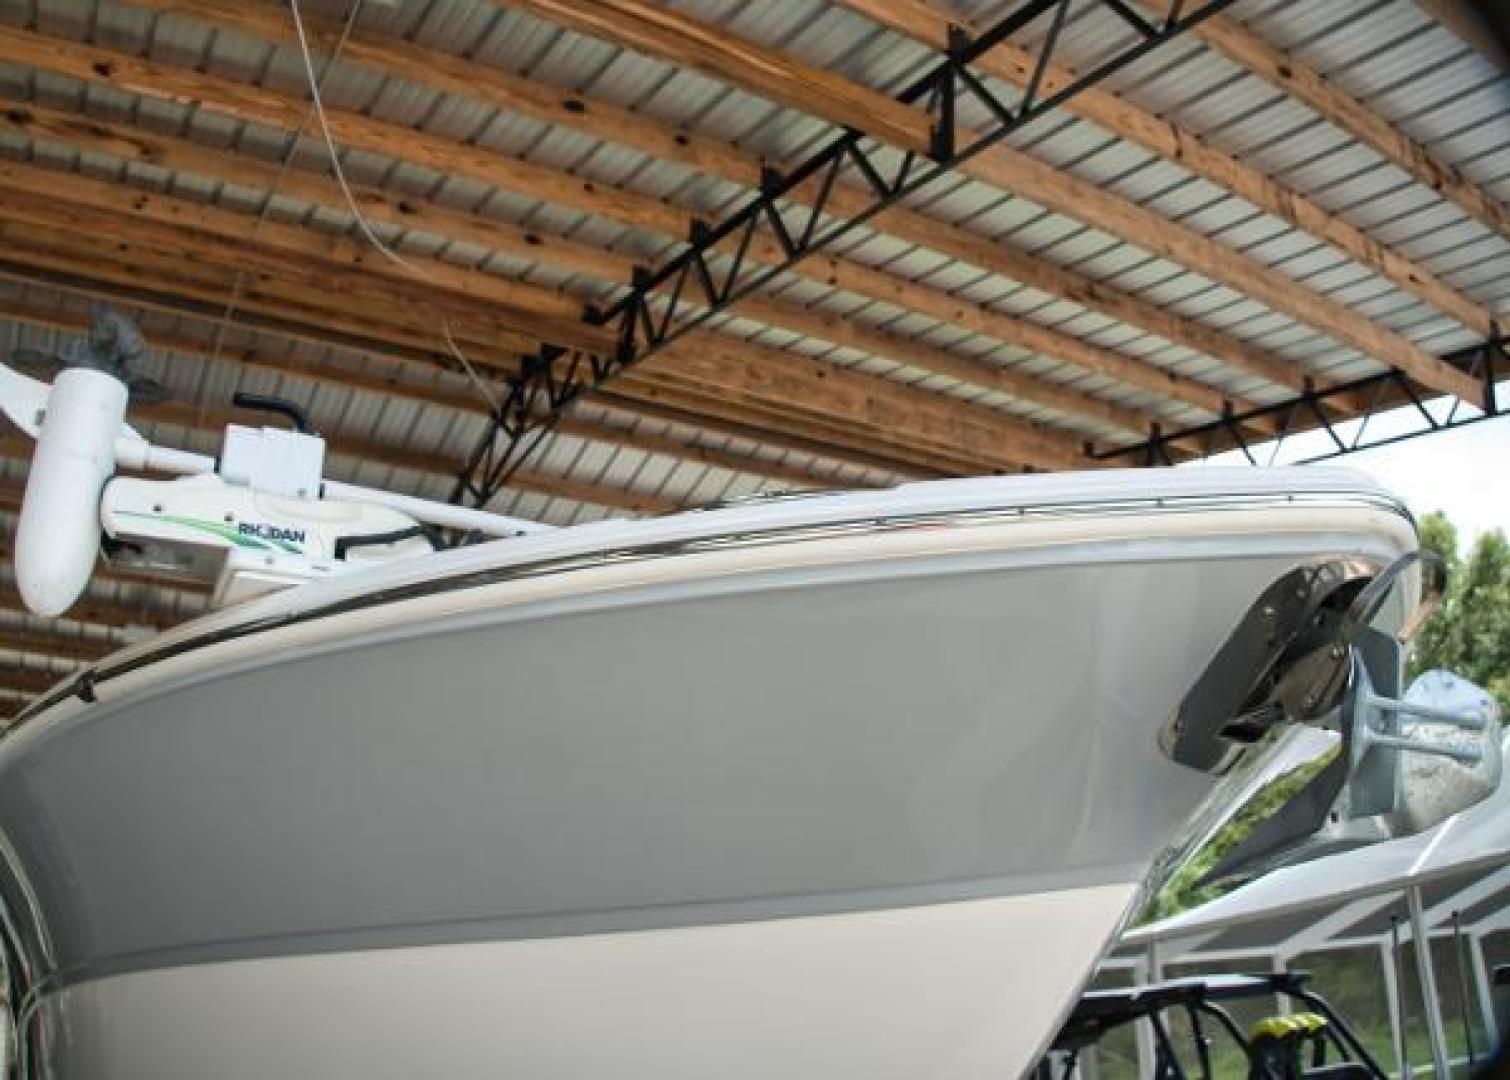 Sea Fox-328 Commander 2020-Sea Fox 328 Commander Tampa Bay-Florida-United States-1530747 | Thumbnail